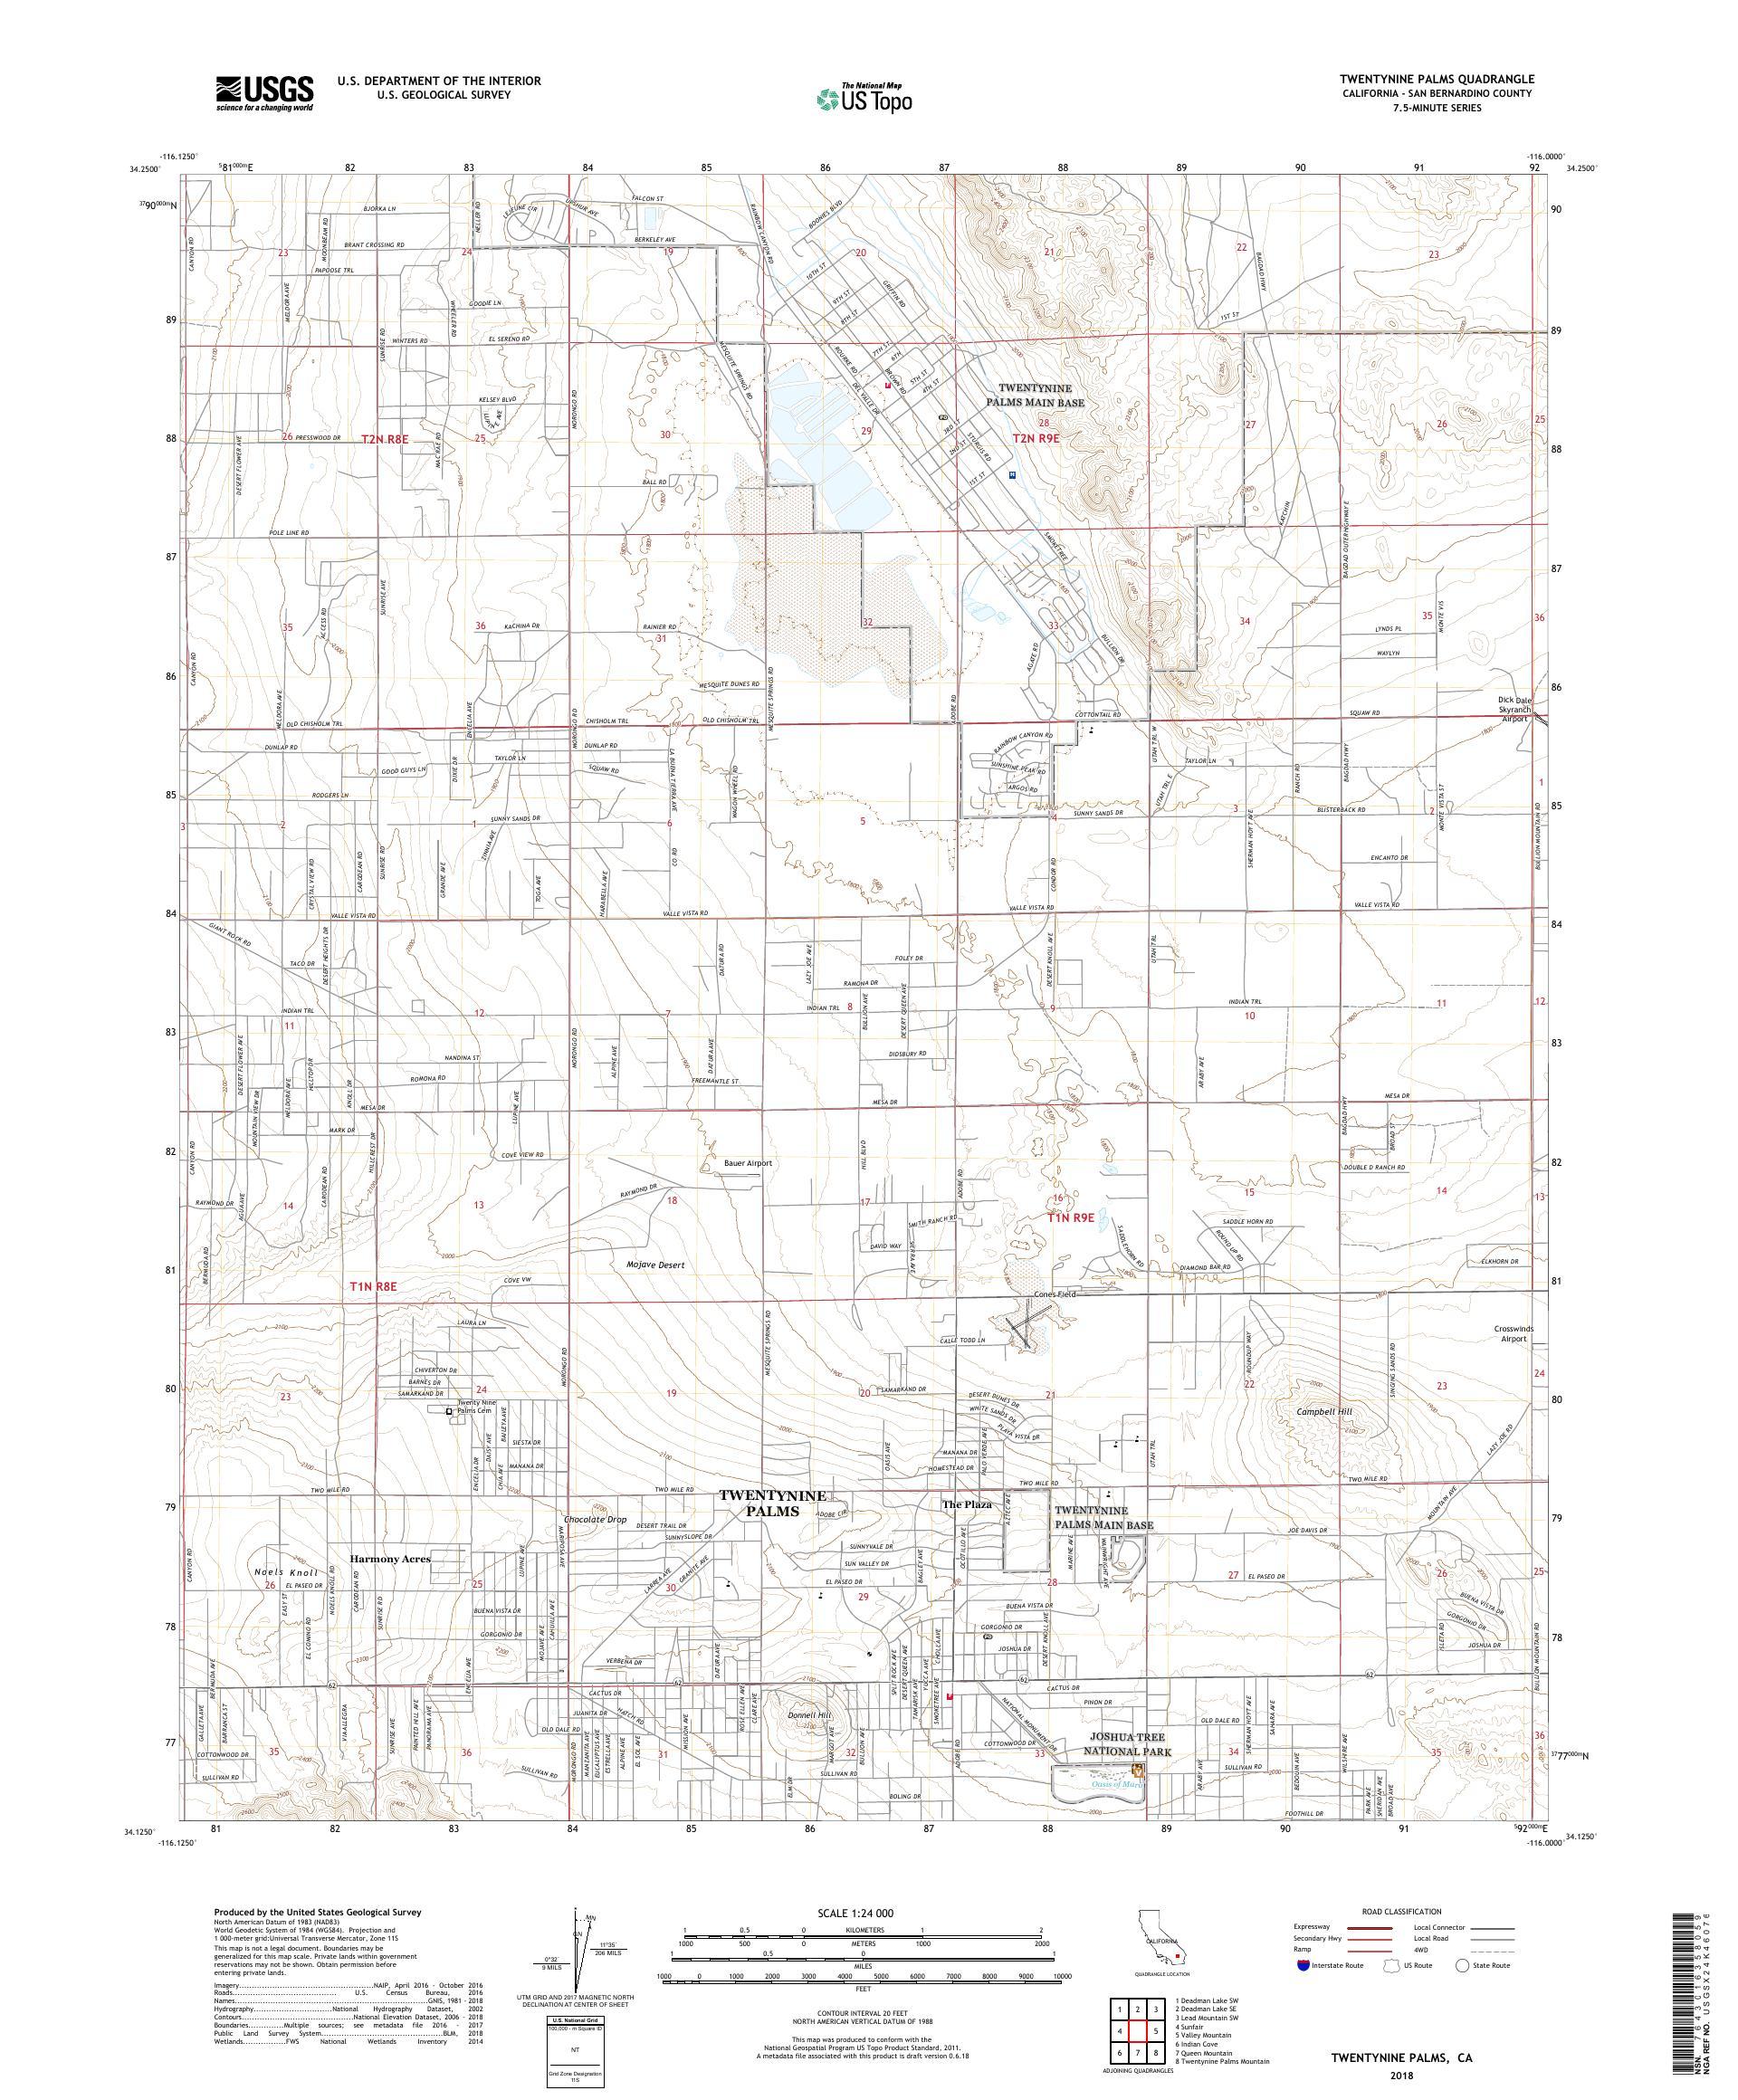 MyTopo Twentynine Palms, California USGS Quad Topo Map